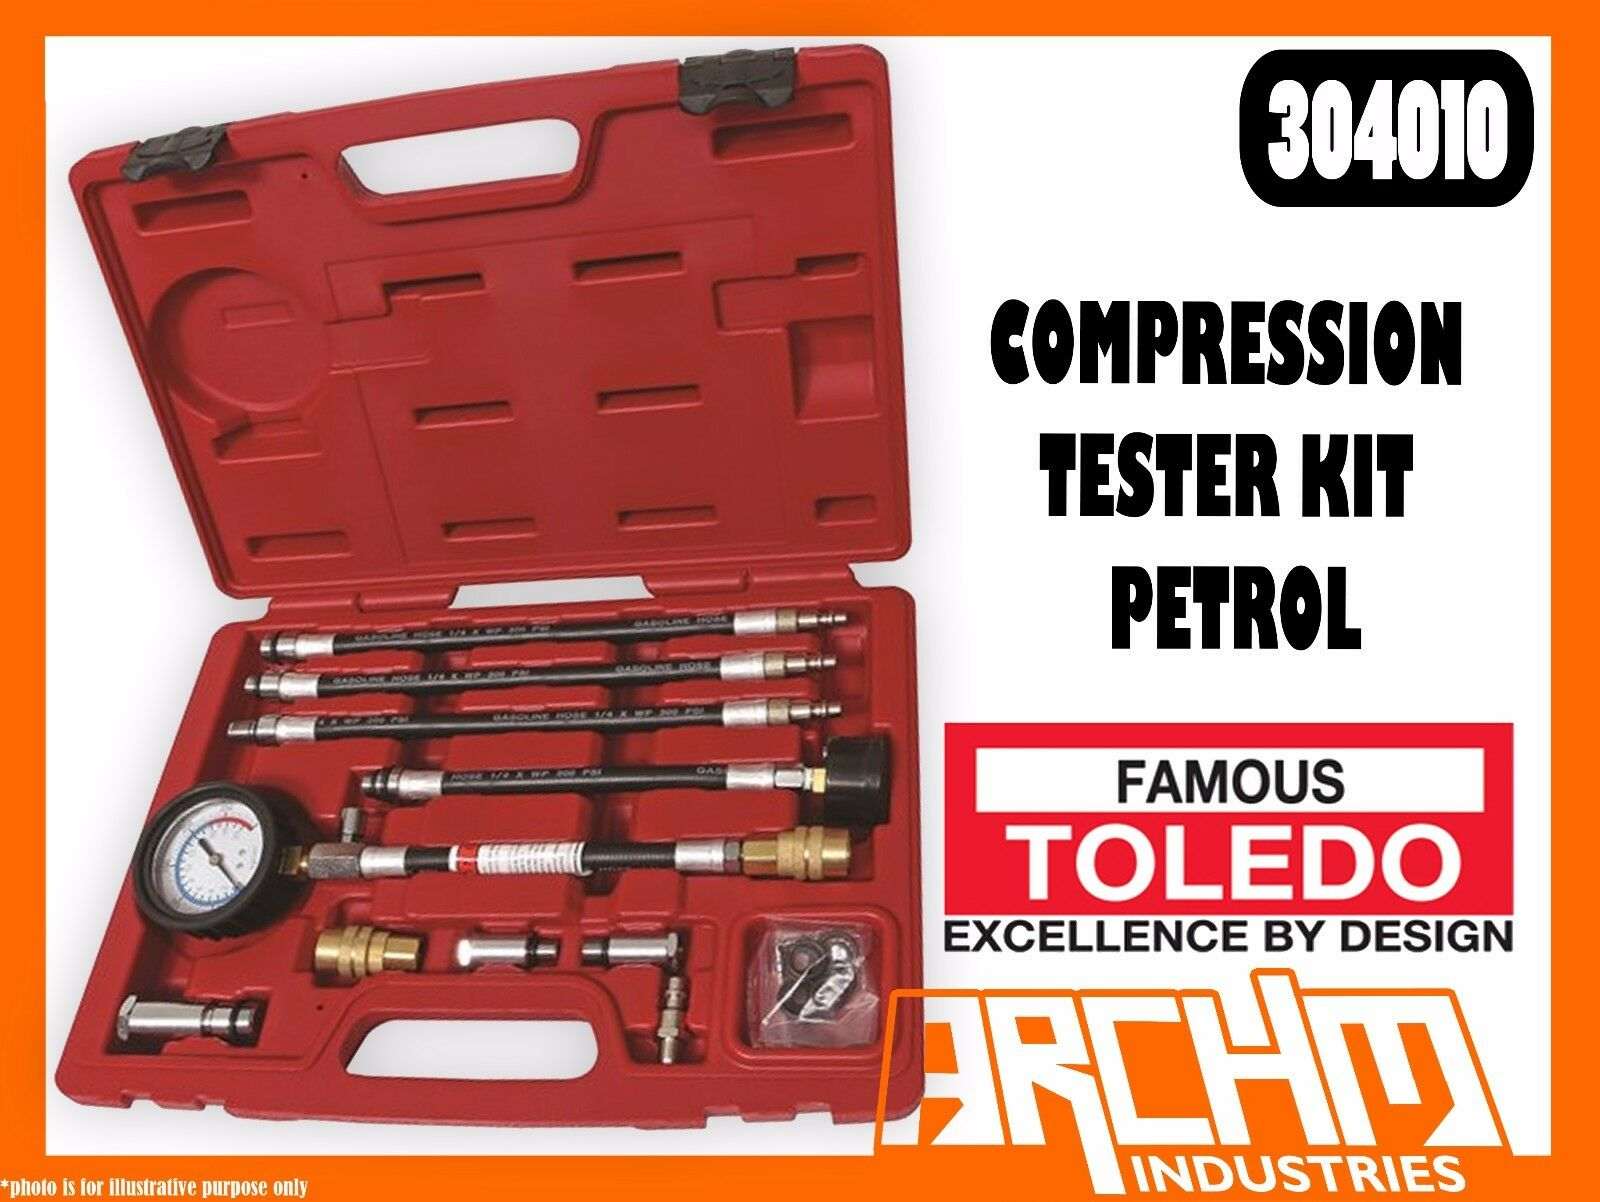 TOLEDO 304010 - COMPRESSION TESTER KIT - PETROL - ENGINES SPARK PLUGS 0-300 PSI